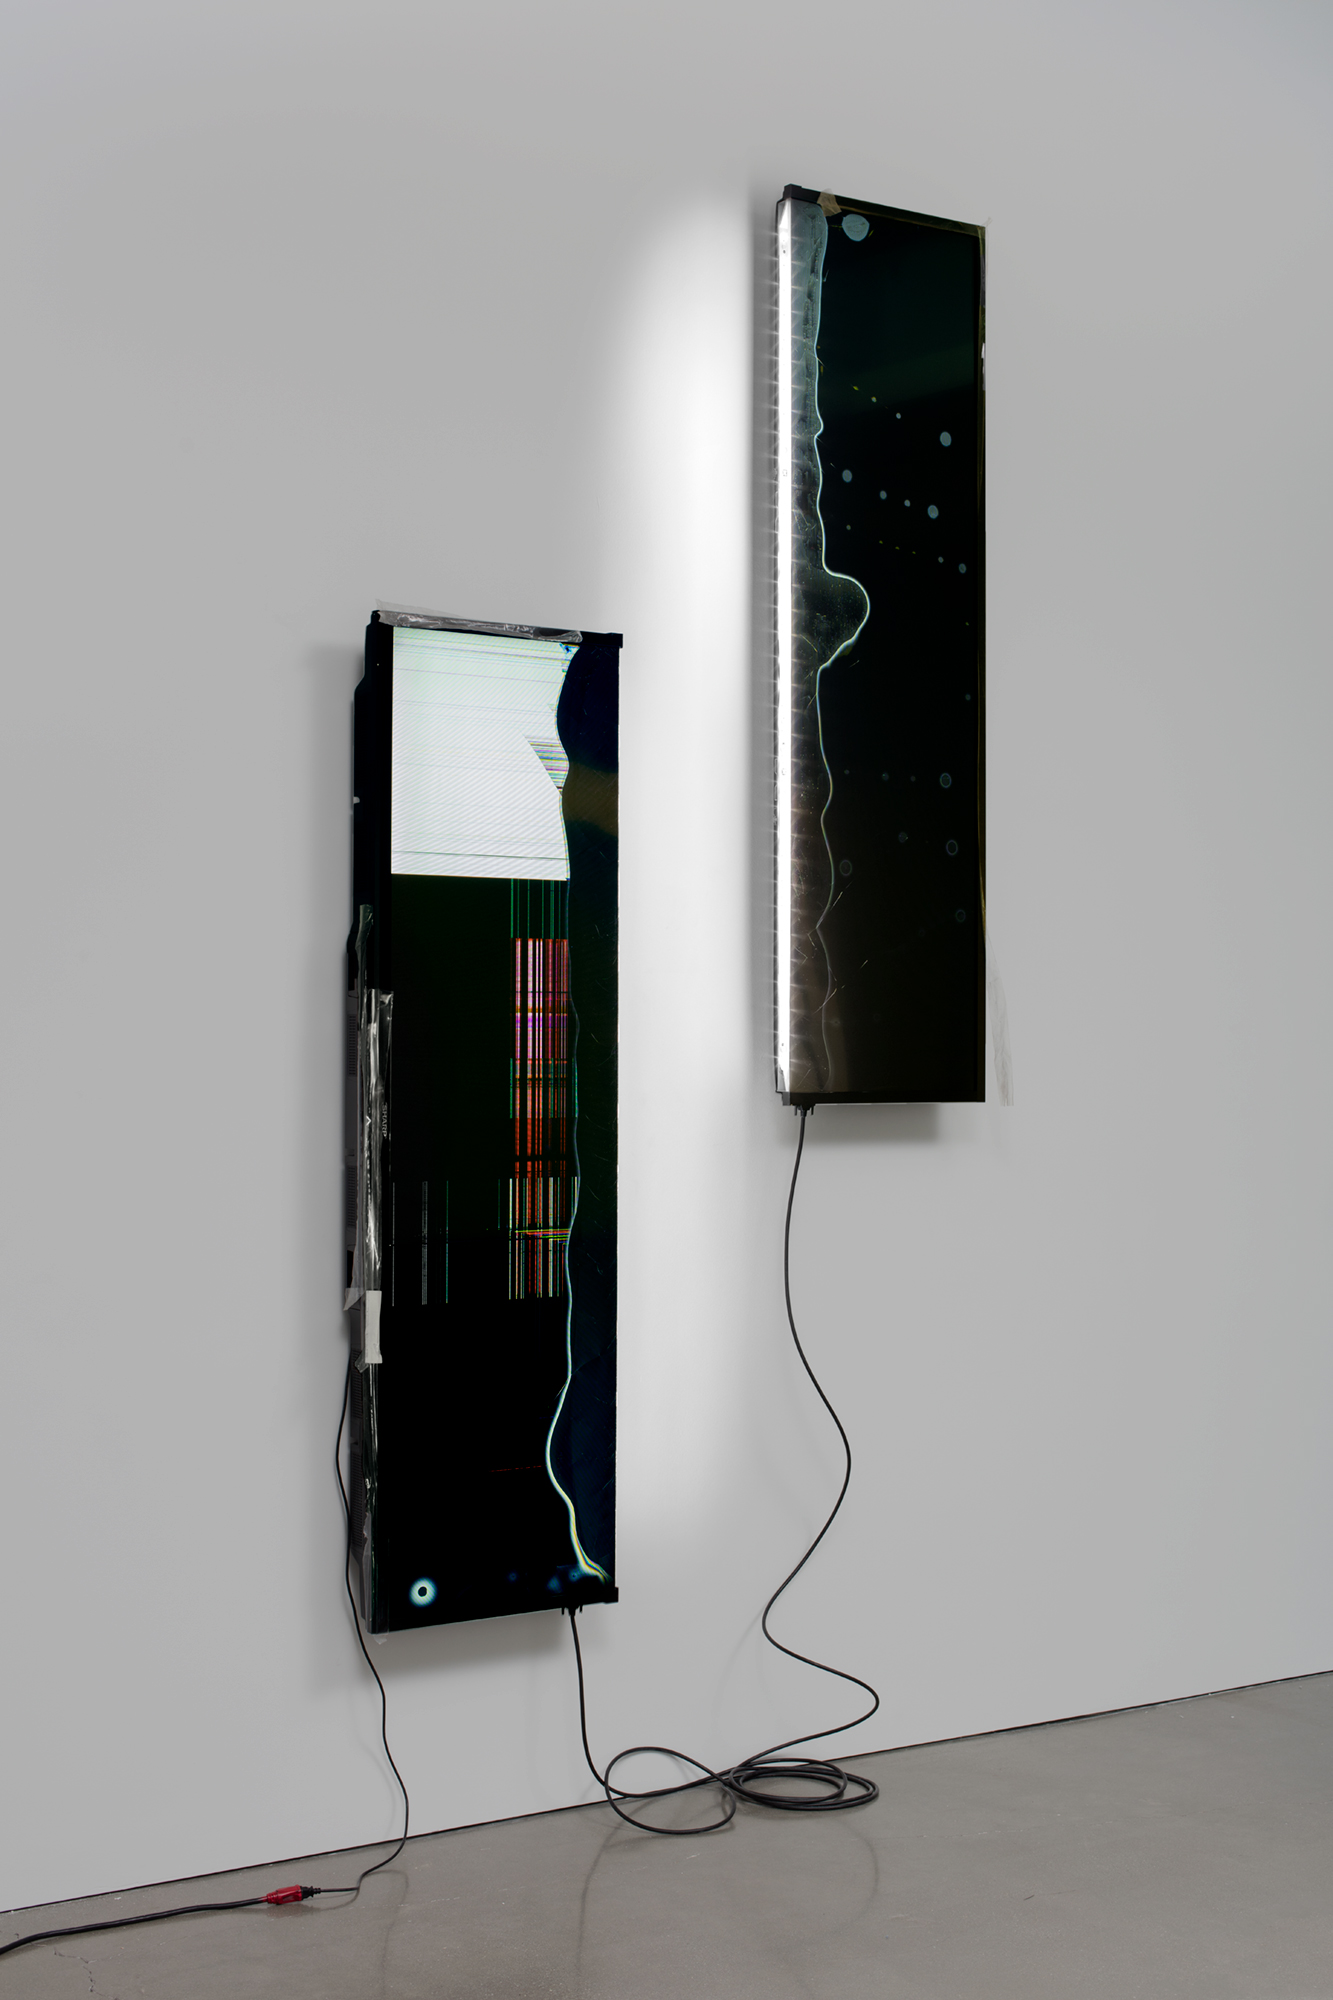 <del>Sharp PN-LE901 90-inch HD 1080p LED-backlit LCD TV</del>